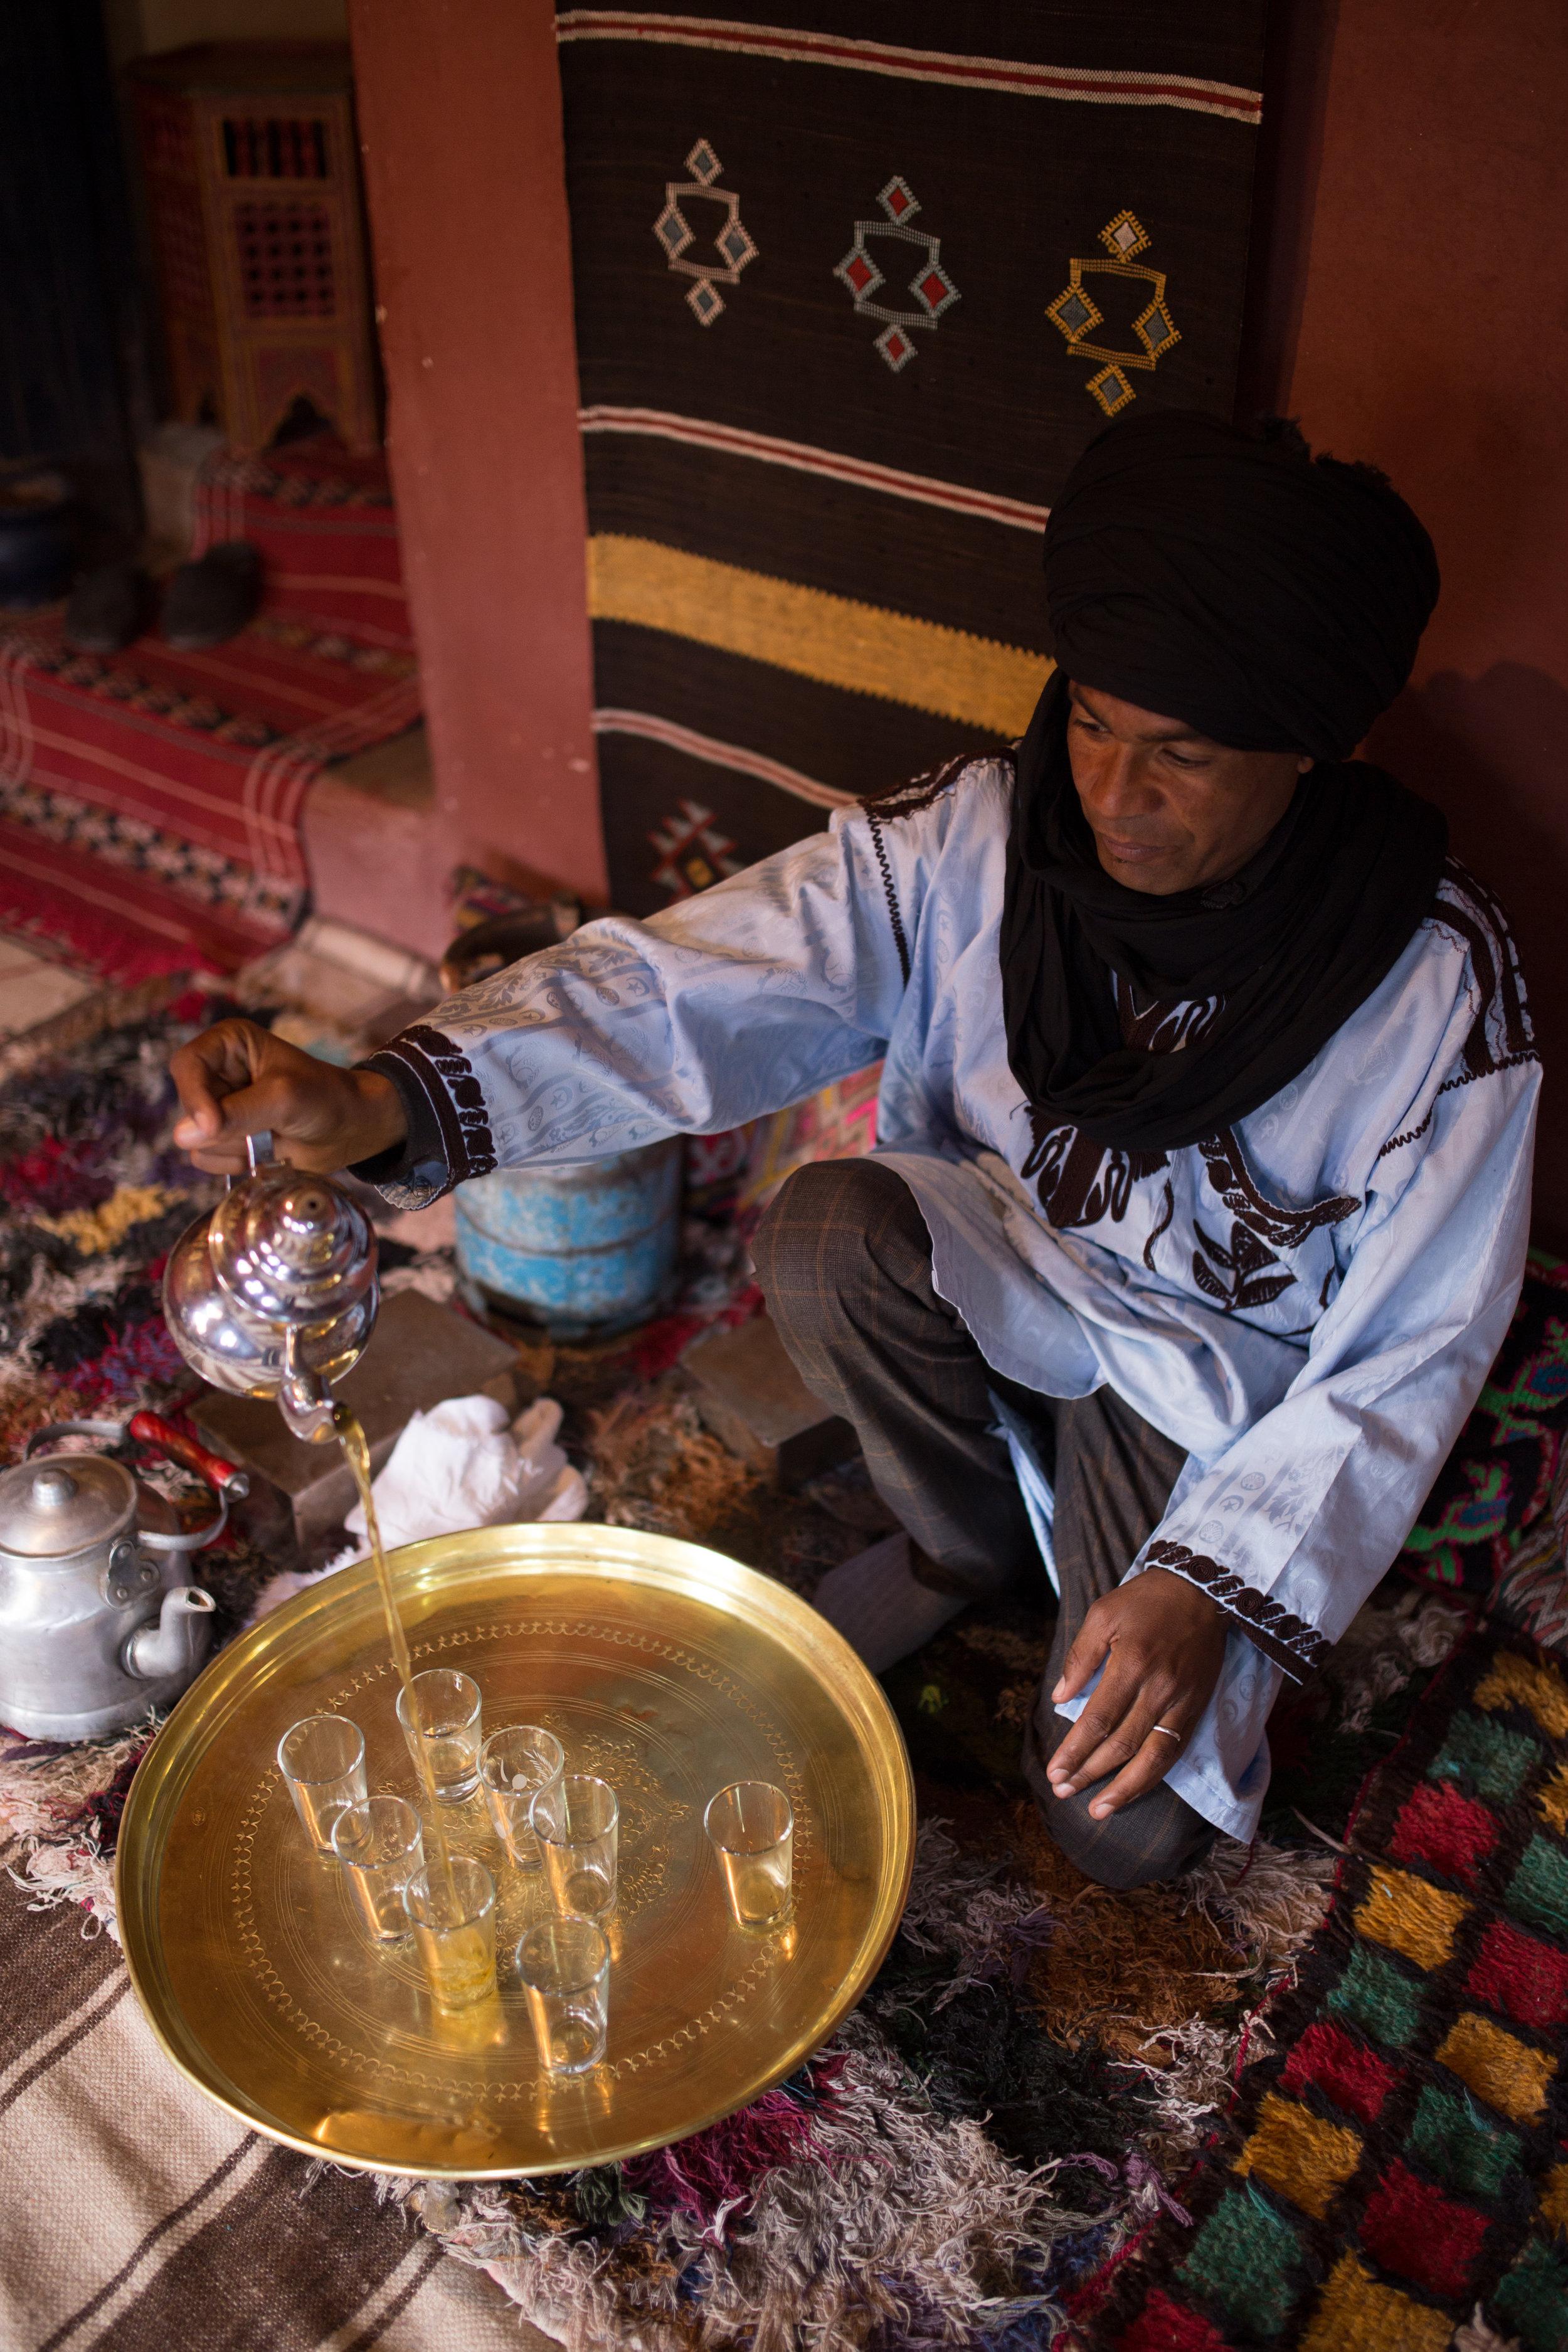 morocco-morocco travel-visit morocco-travel-travel photography-travel photographer-alina mendoza-alina mendoza photography-136.jpg